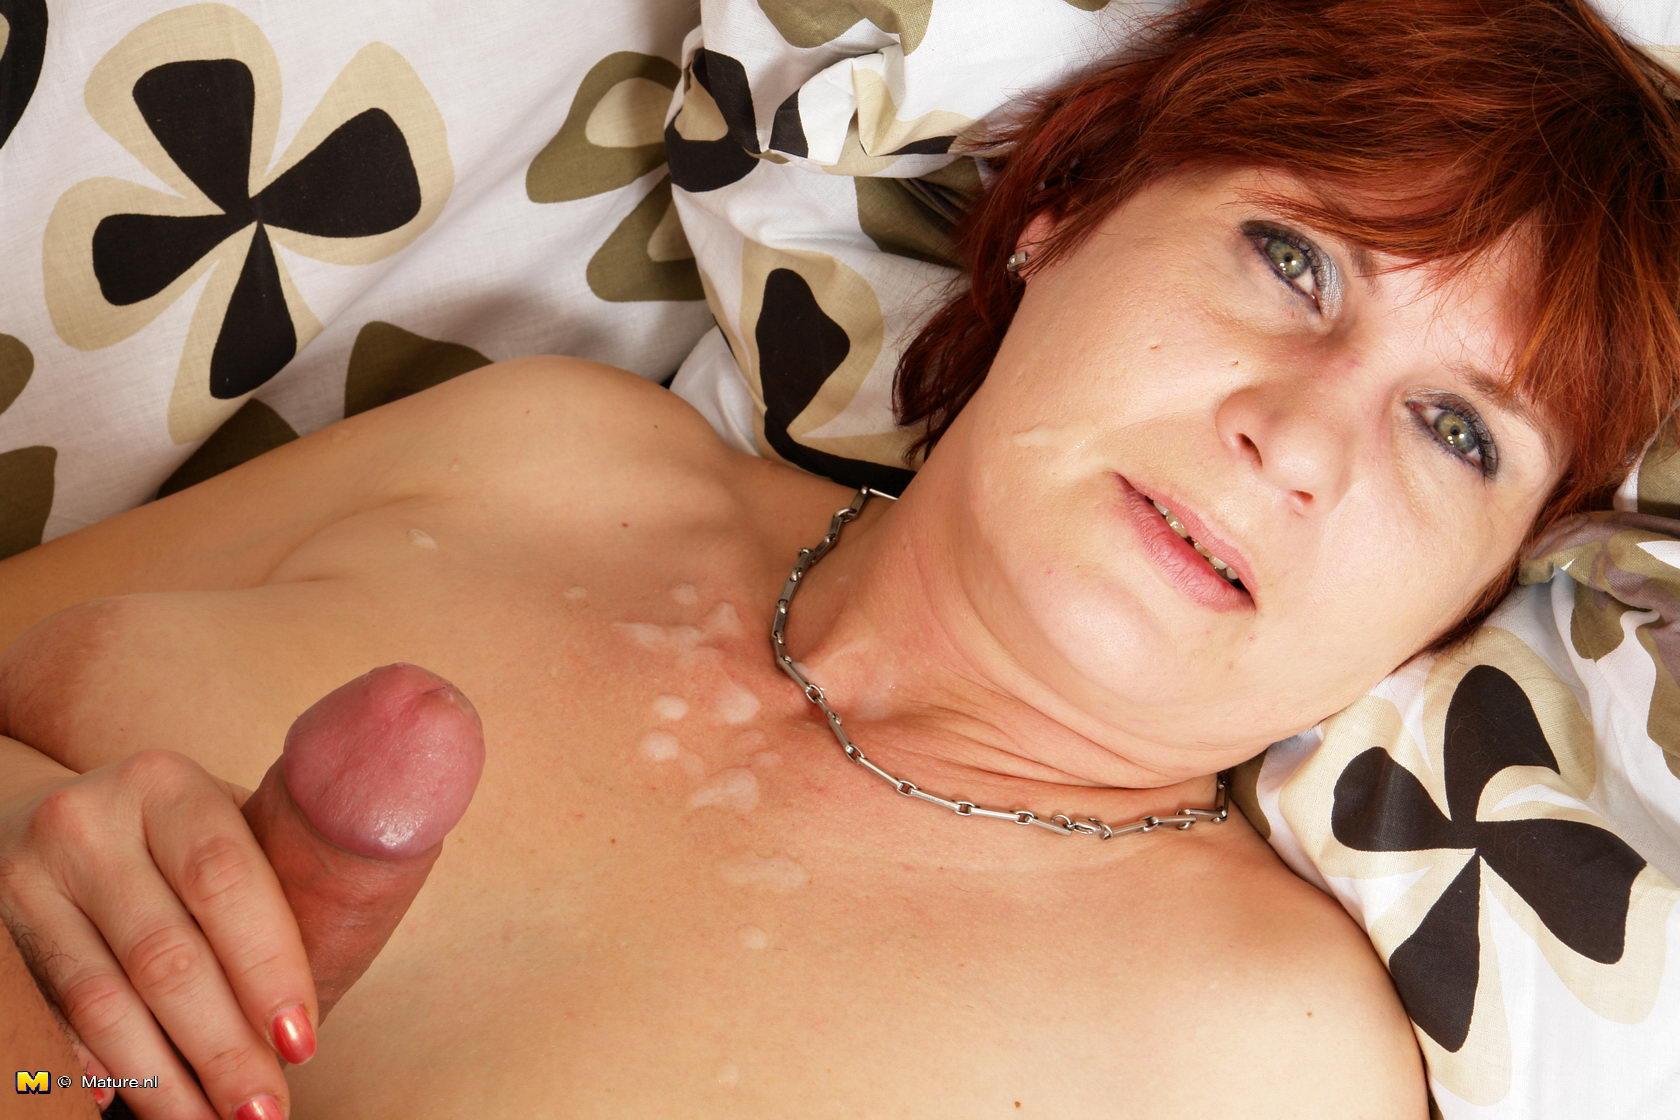 Секс с 60 летней бабкой: http://bux2010.ru/2015/01/11/seks-s-60-letnej-babkoj.html